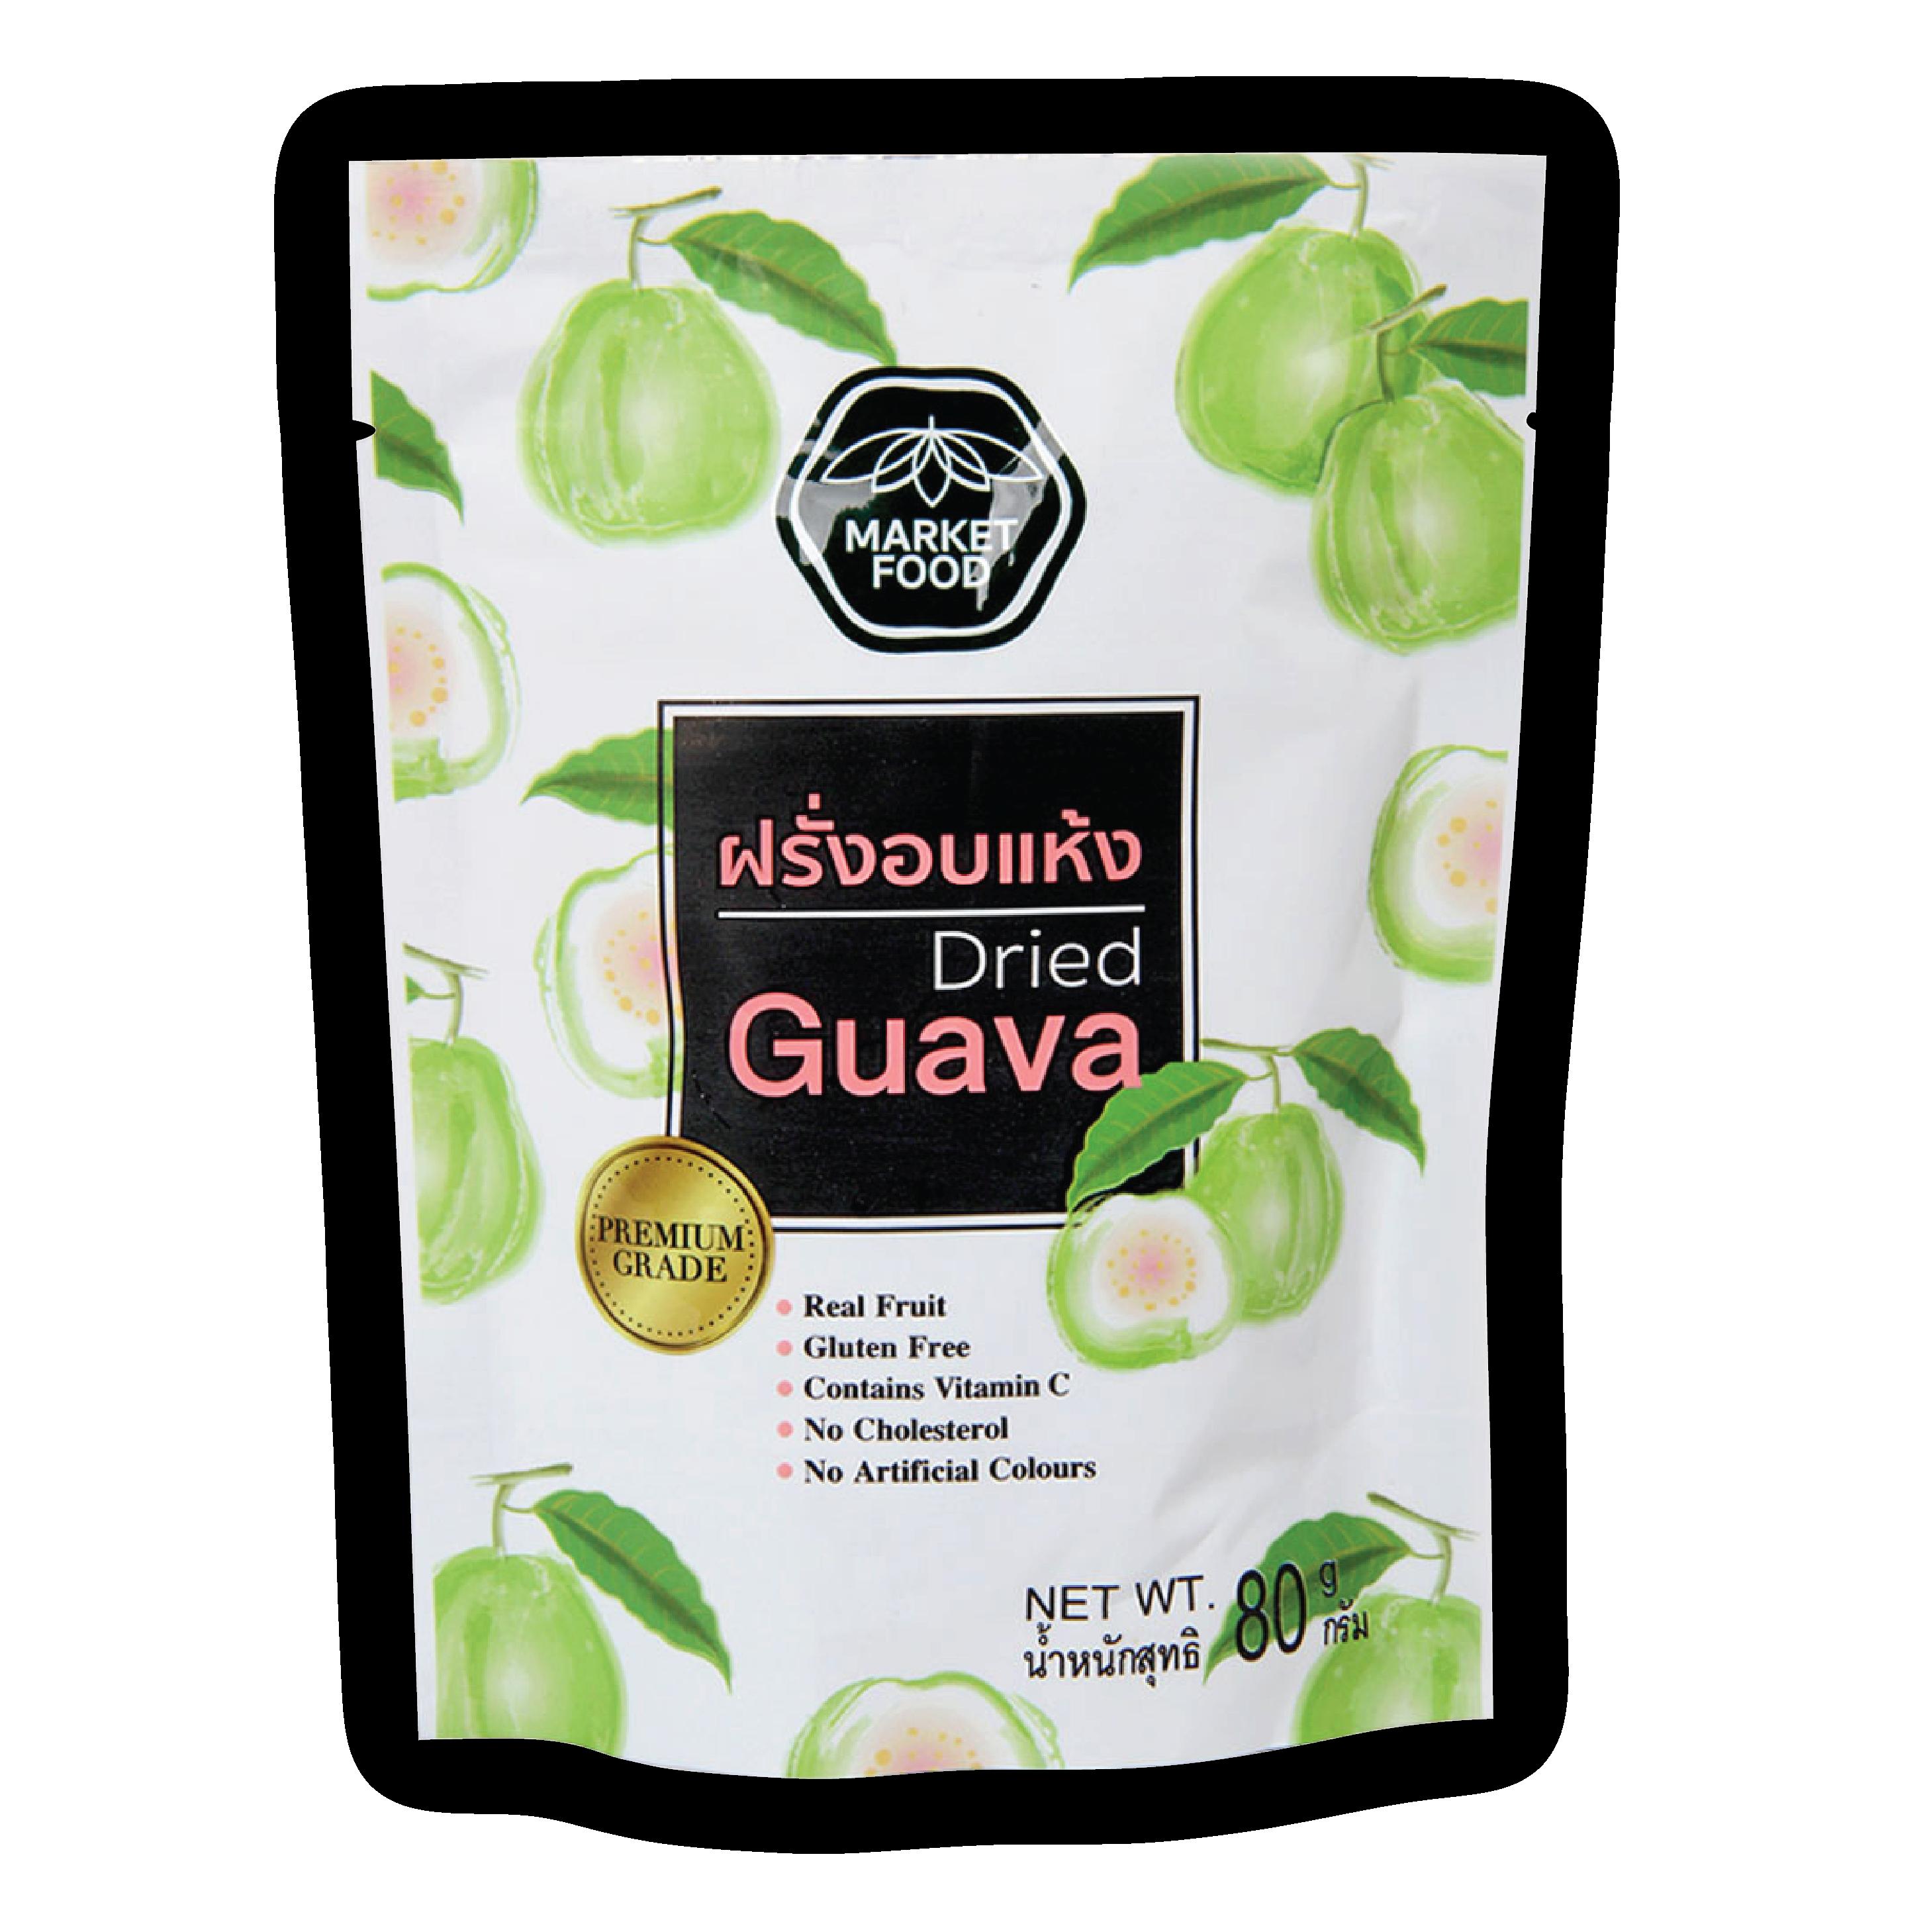 Dried Guava